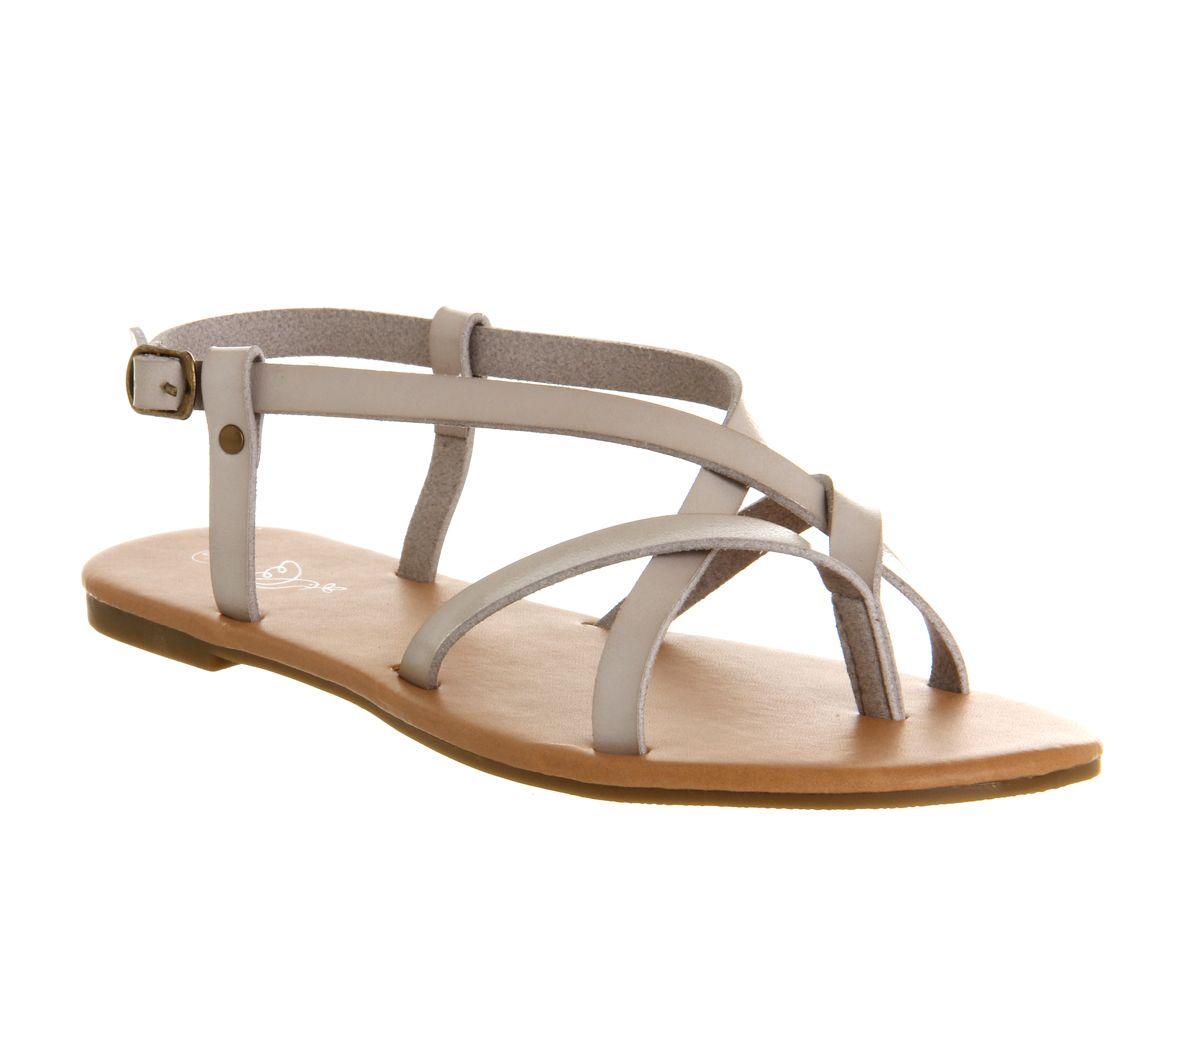 57716b3fe0d Ugg Australia Gold Audra Sandals